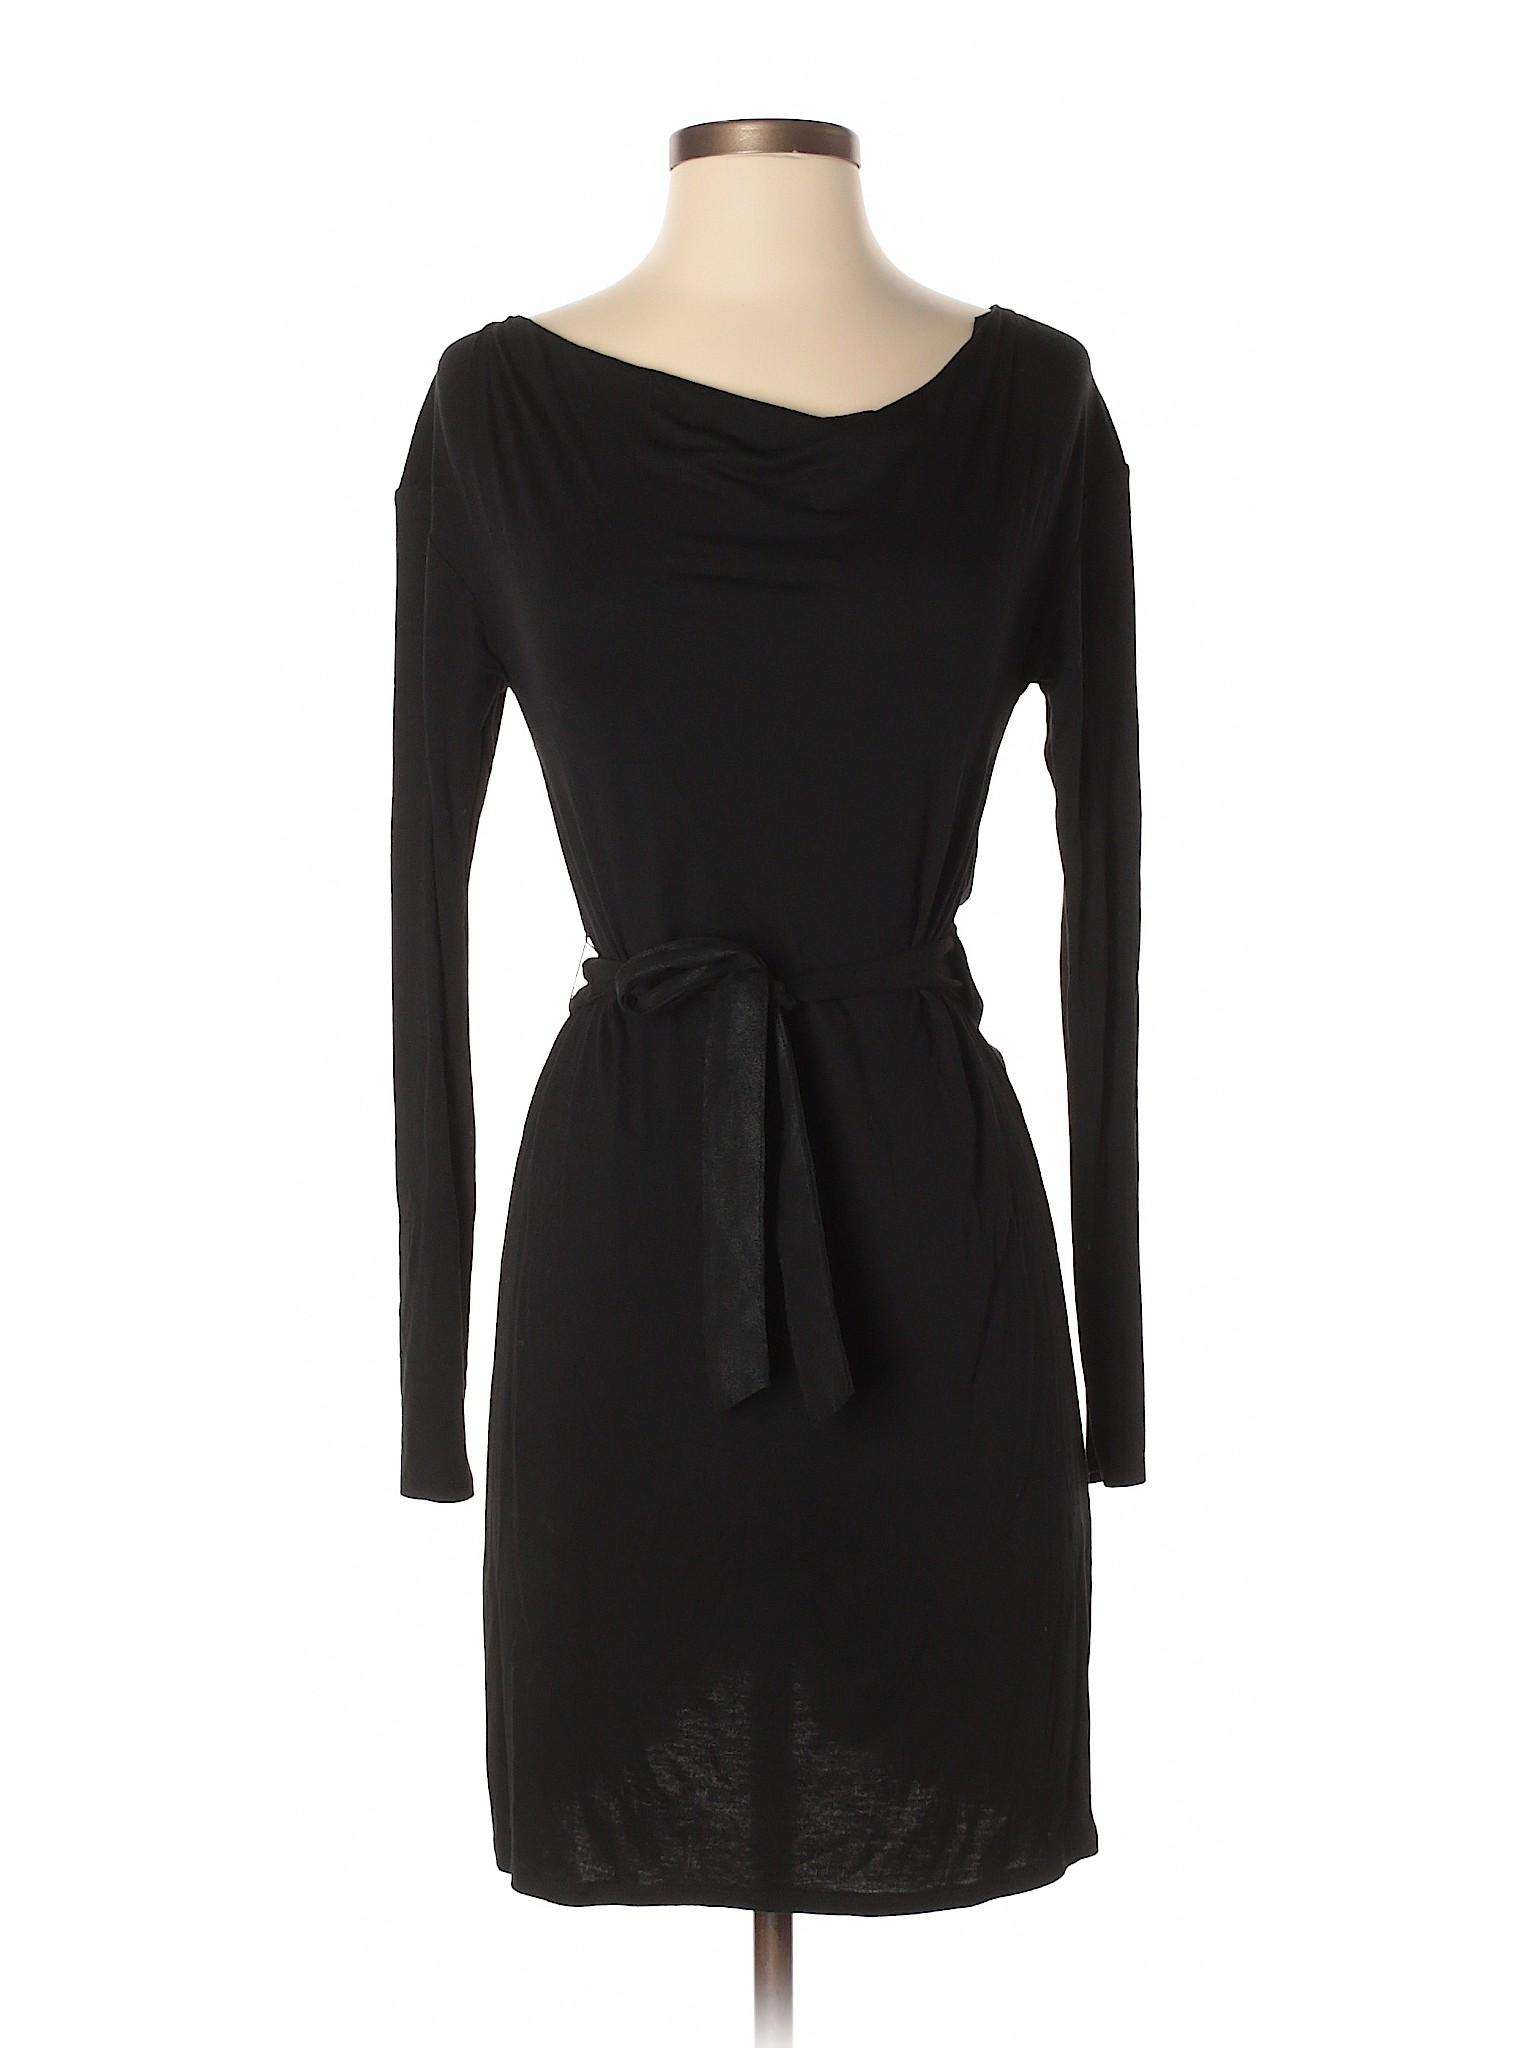 Boutique Boutique BCBGMAXAZRIA winter Boutique Casual Dress winter Dress BCBGMAXAZRIA Casual wXgqPxw1